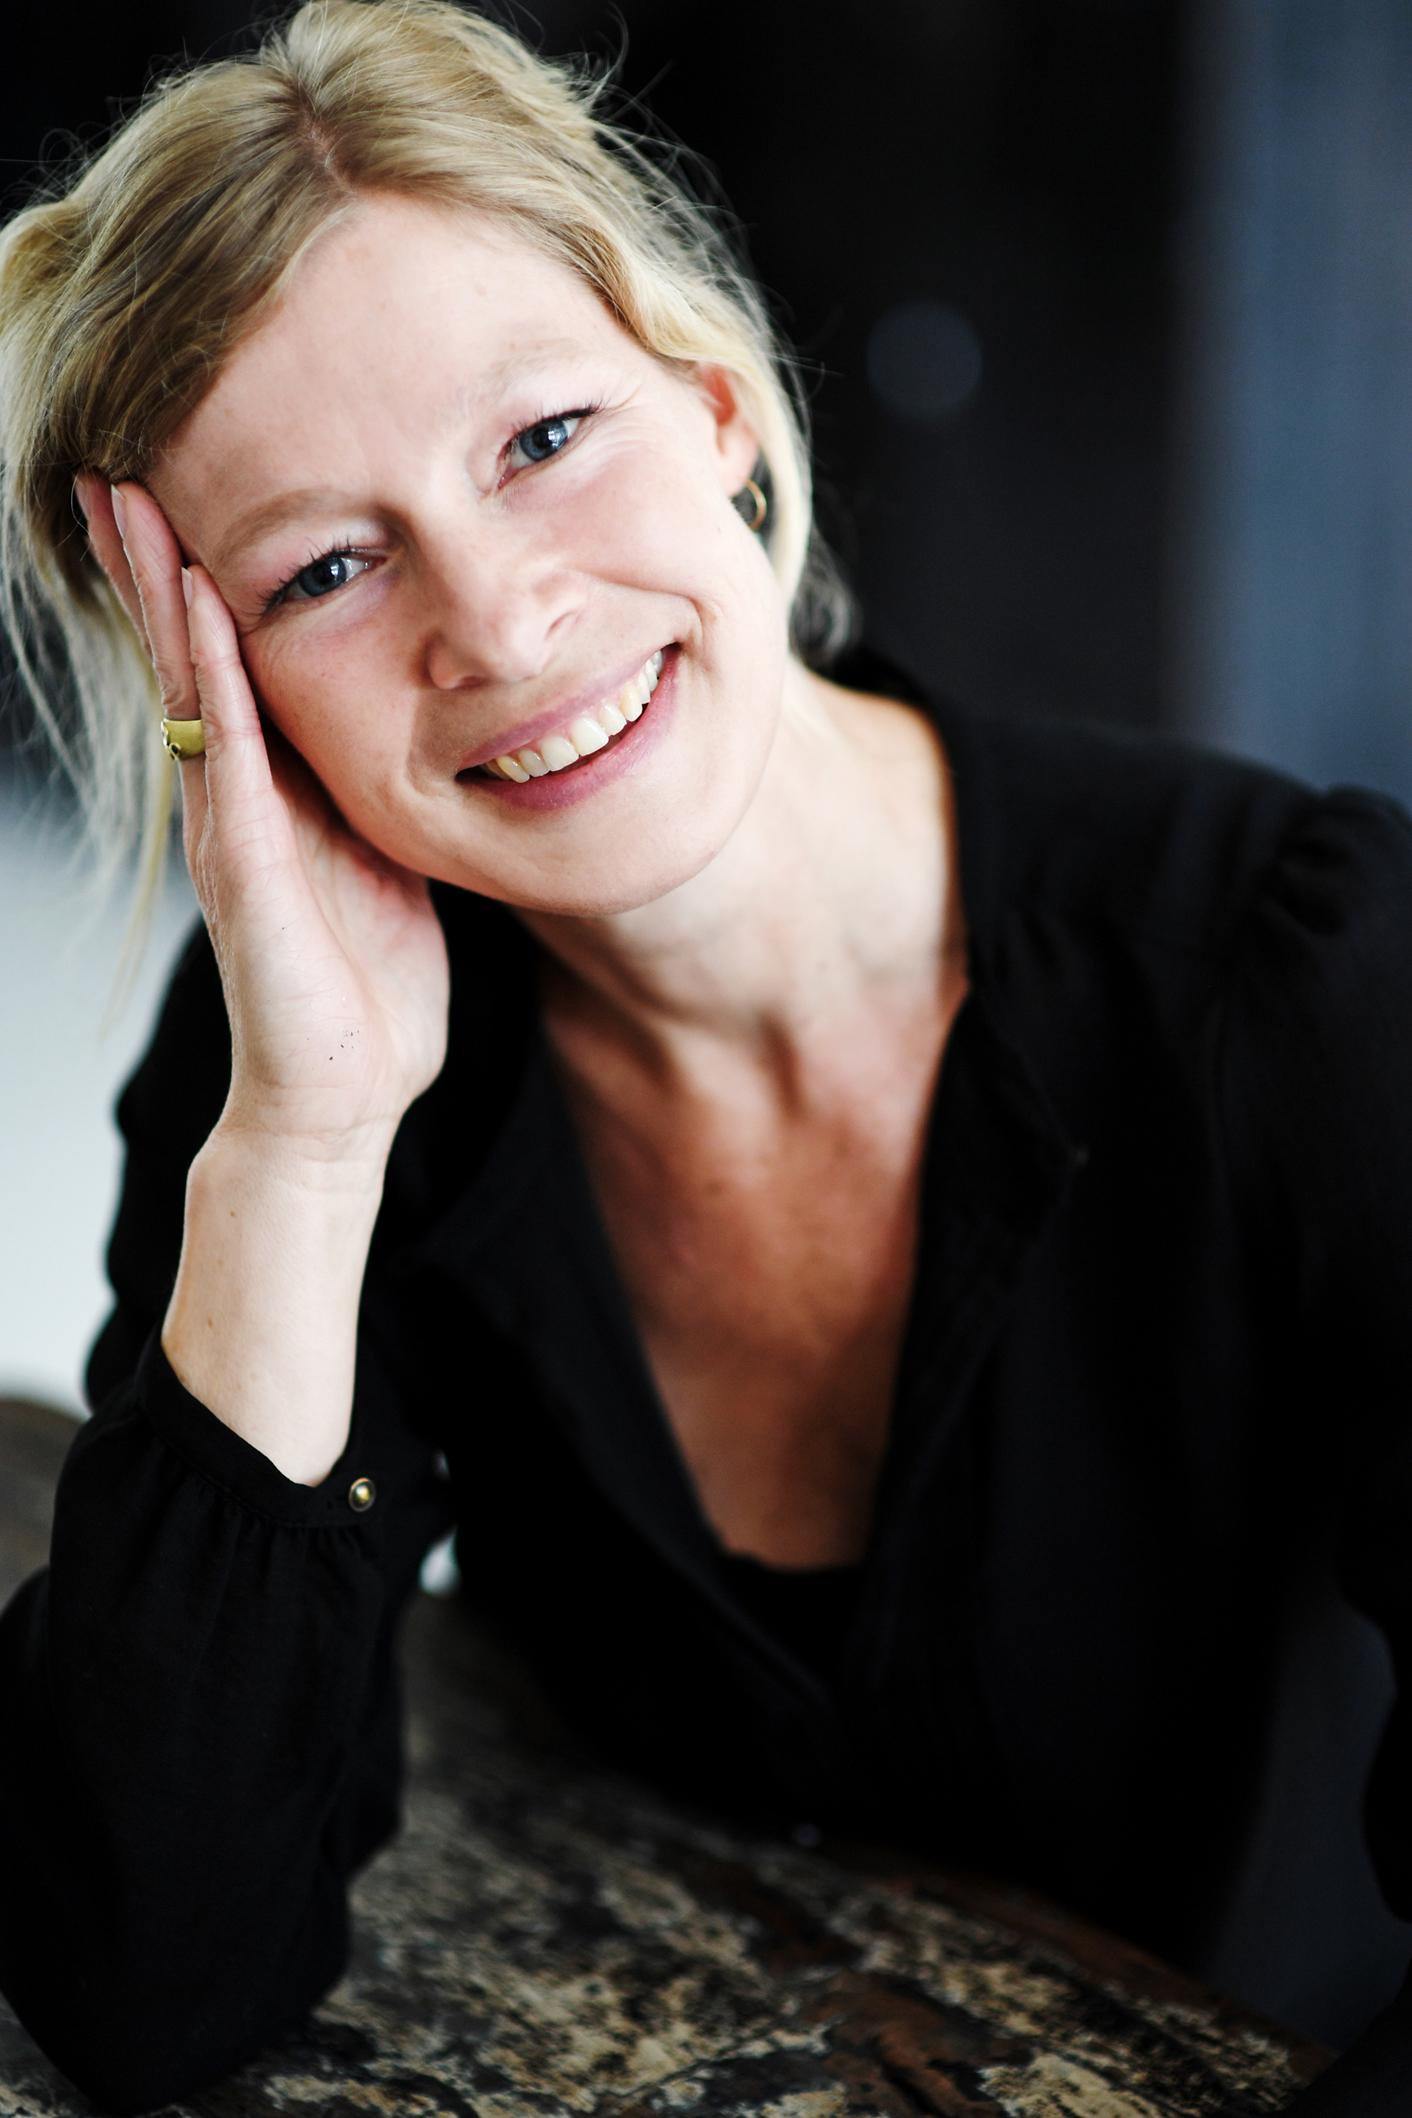 Esther Sluijs